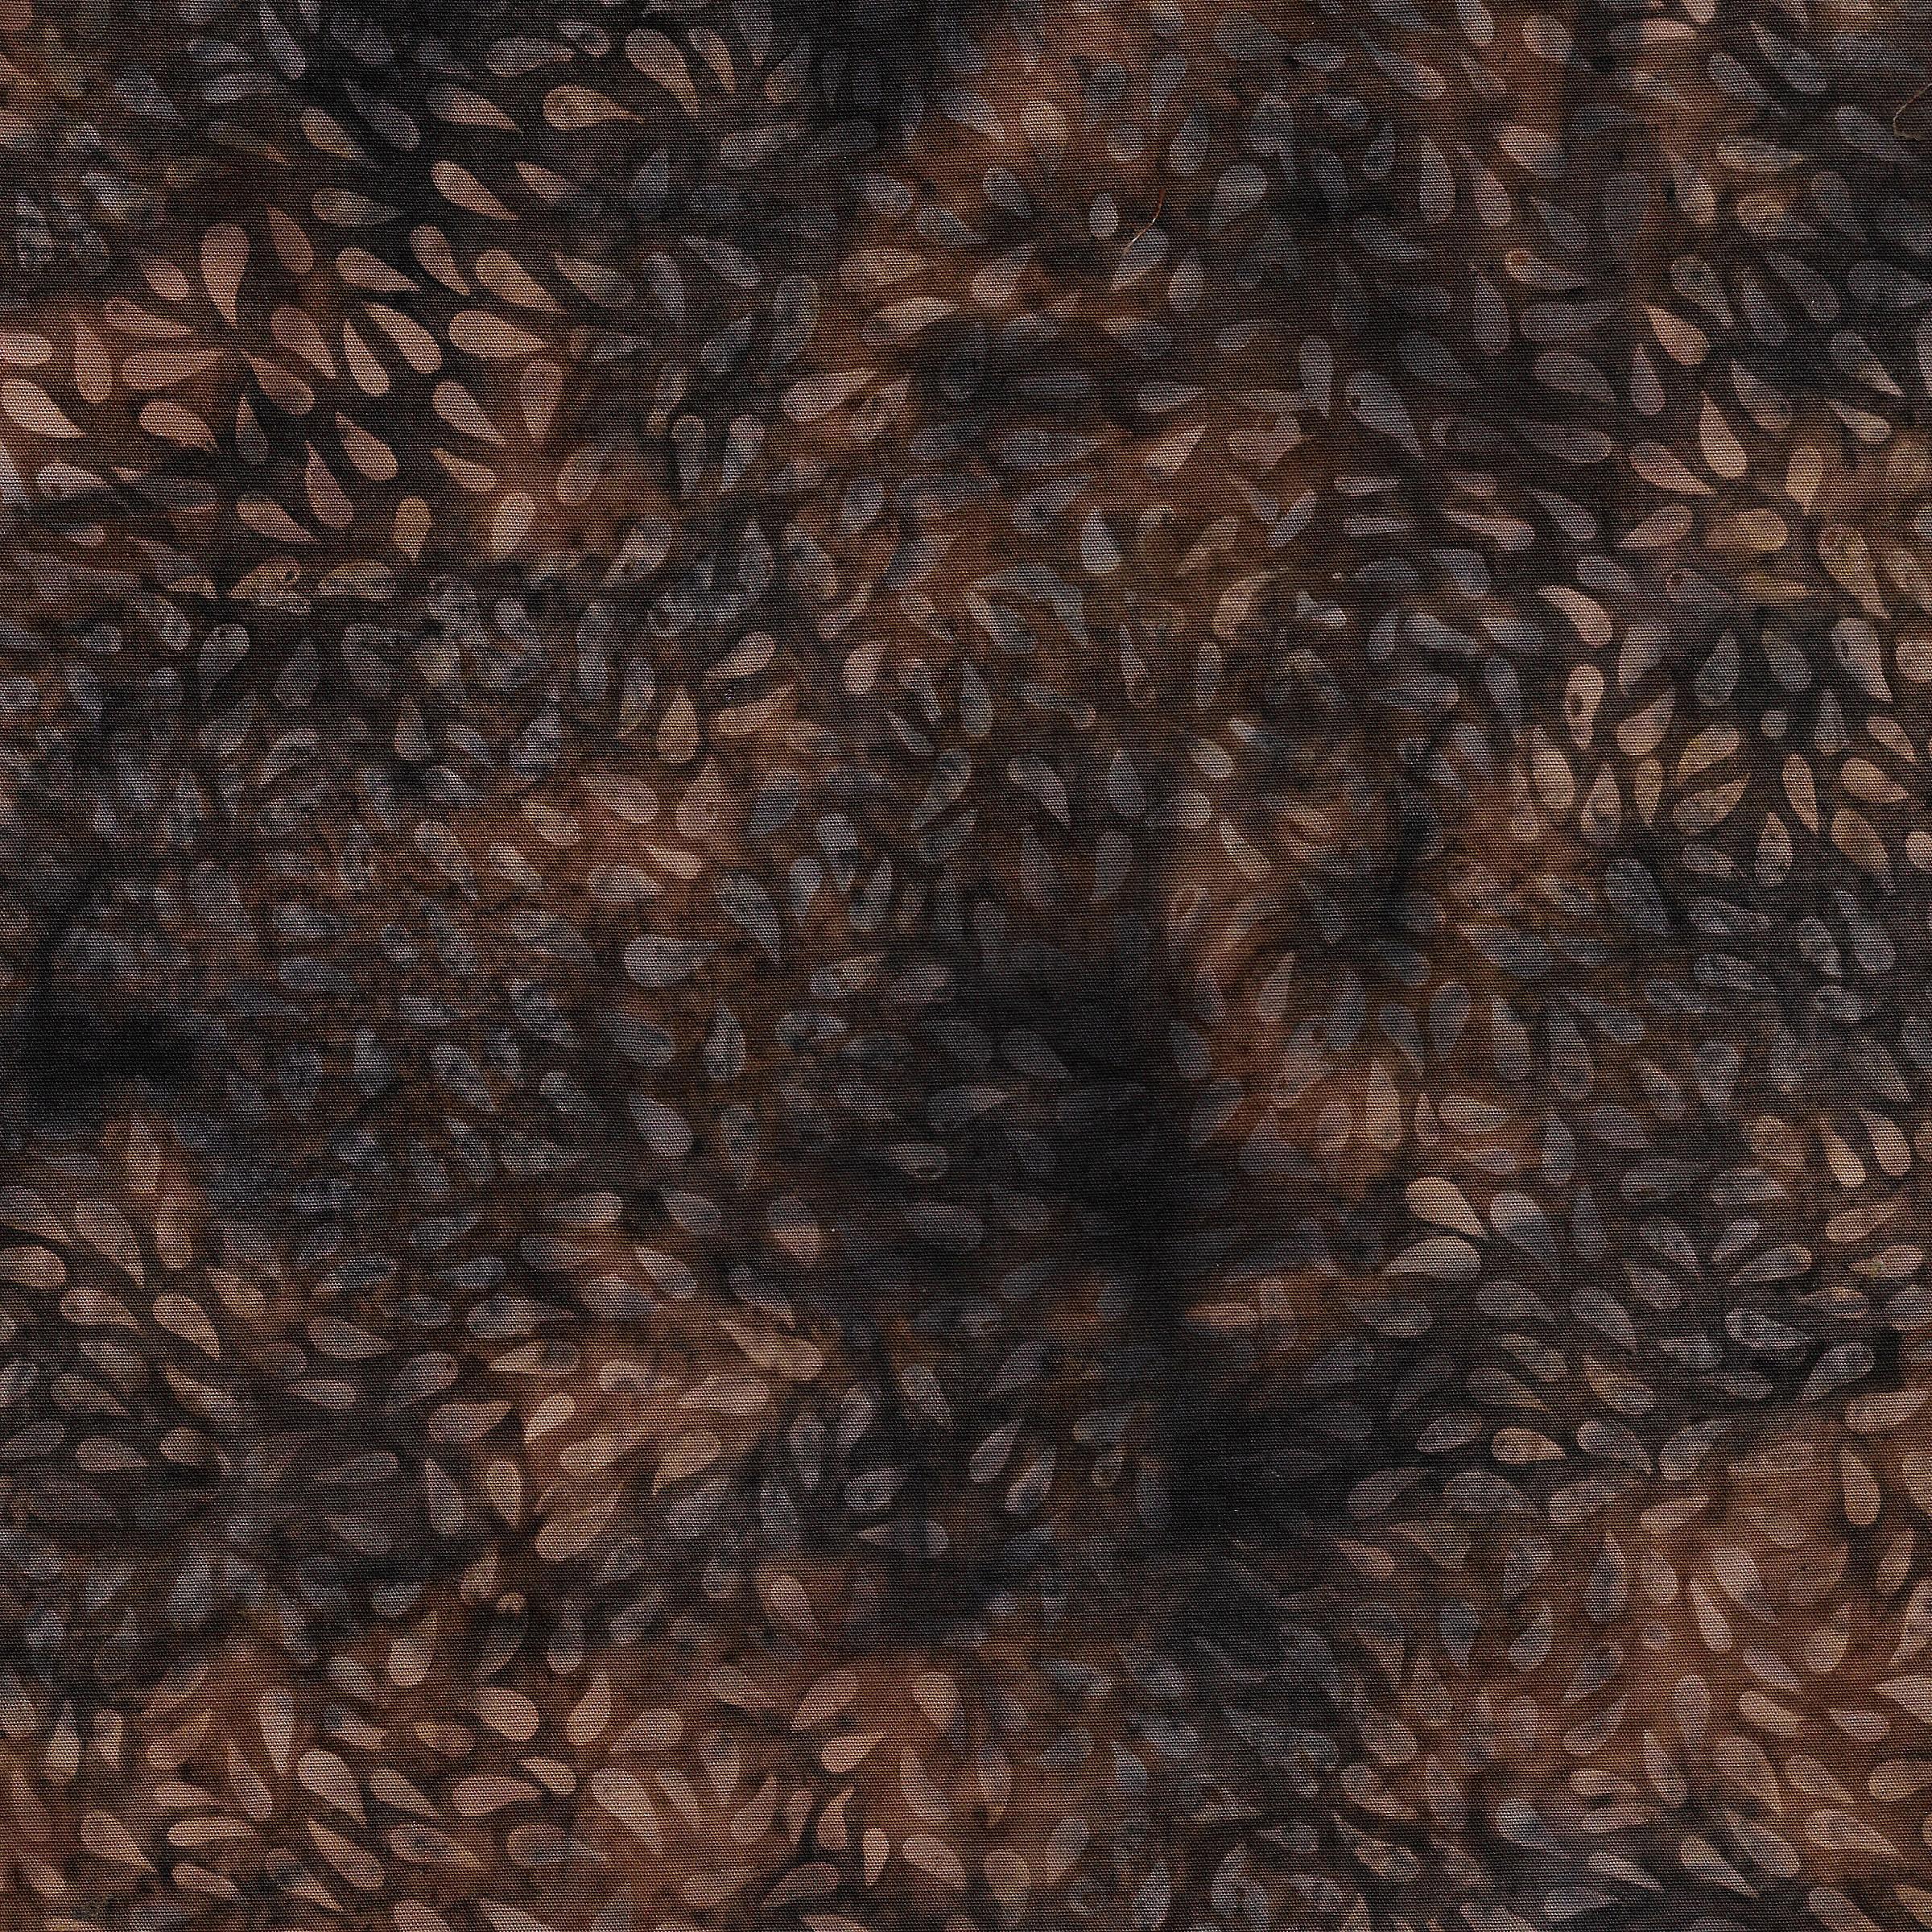 111928095 / Tossed Seeds -Mink